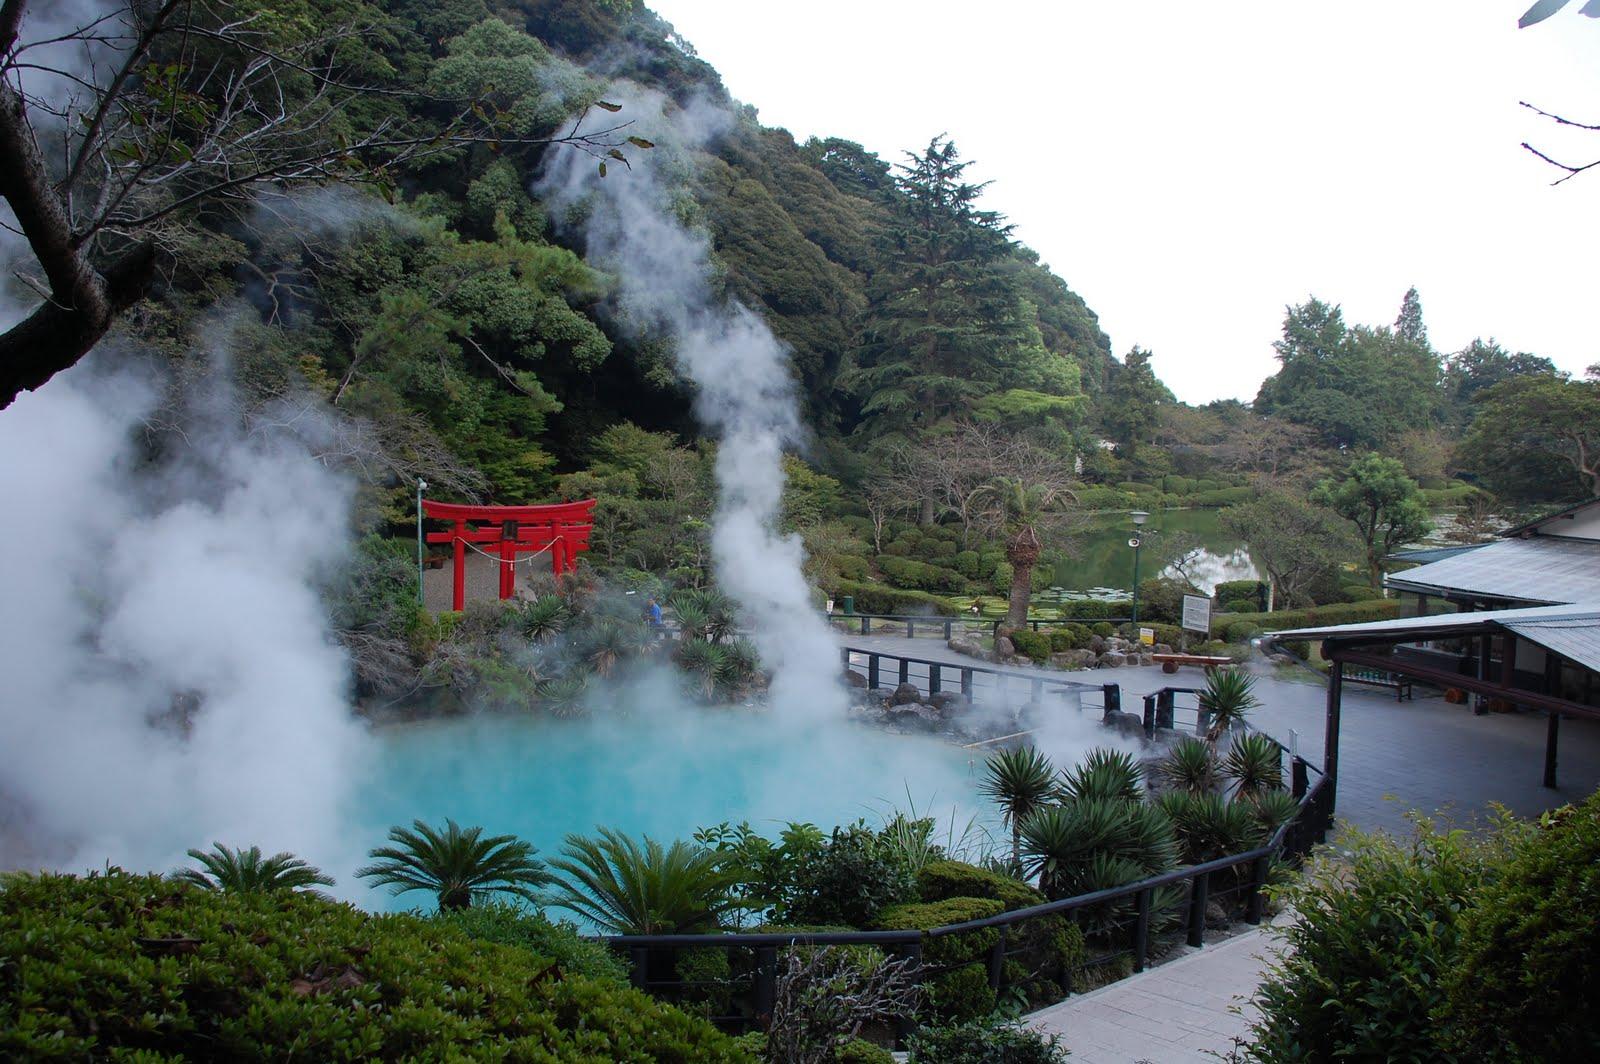 japanese-beauty-beppu-and-the-nine-hells-secret-world